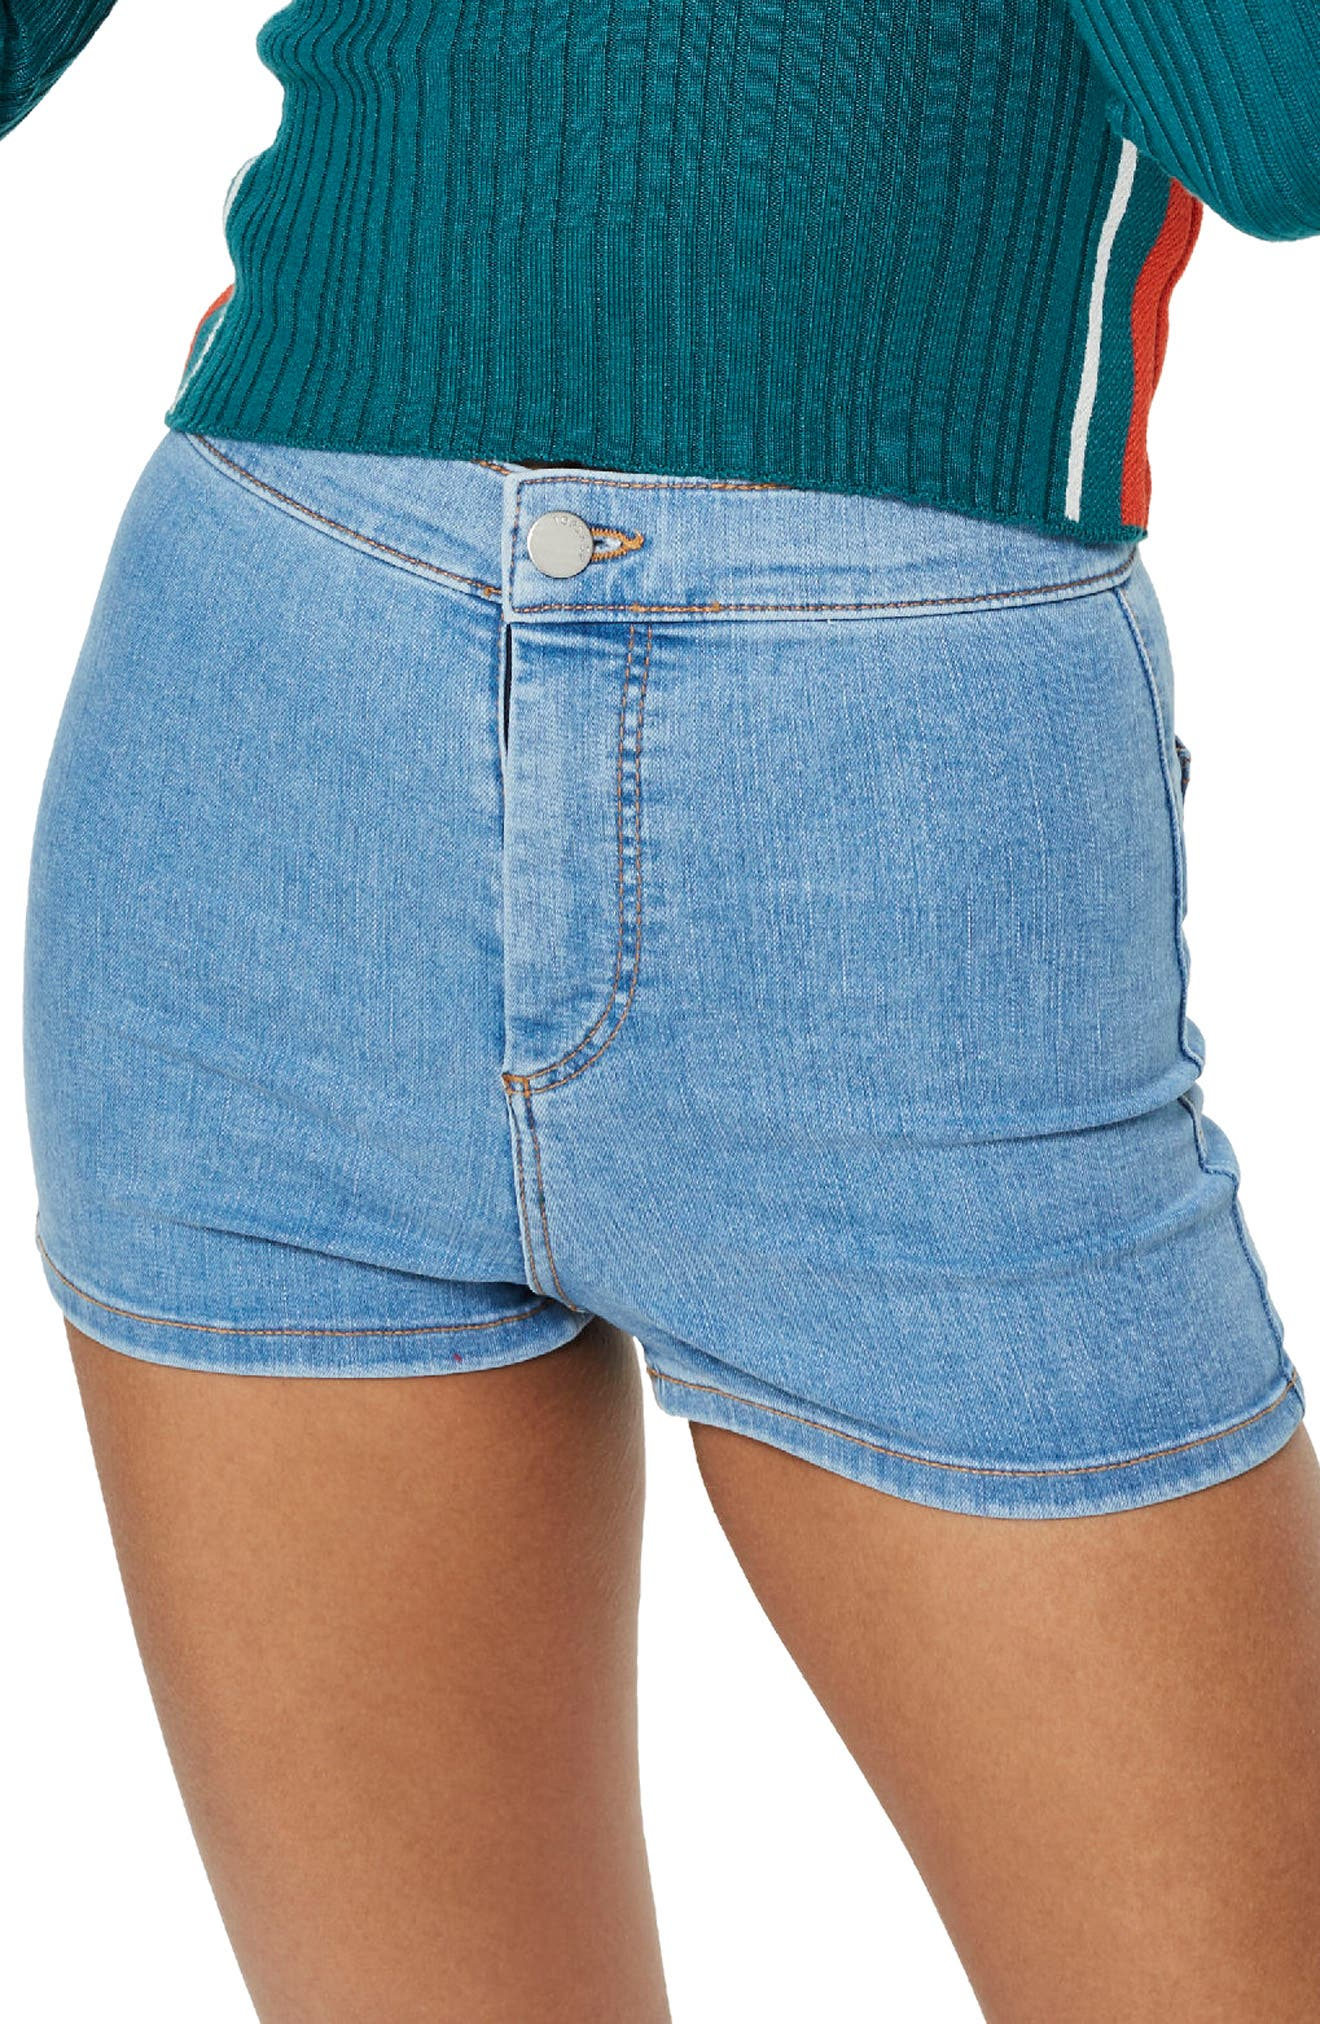 Joni Light Denim High Waist Shorts,                         Main,                         color, Light Denim